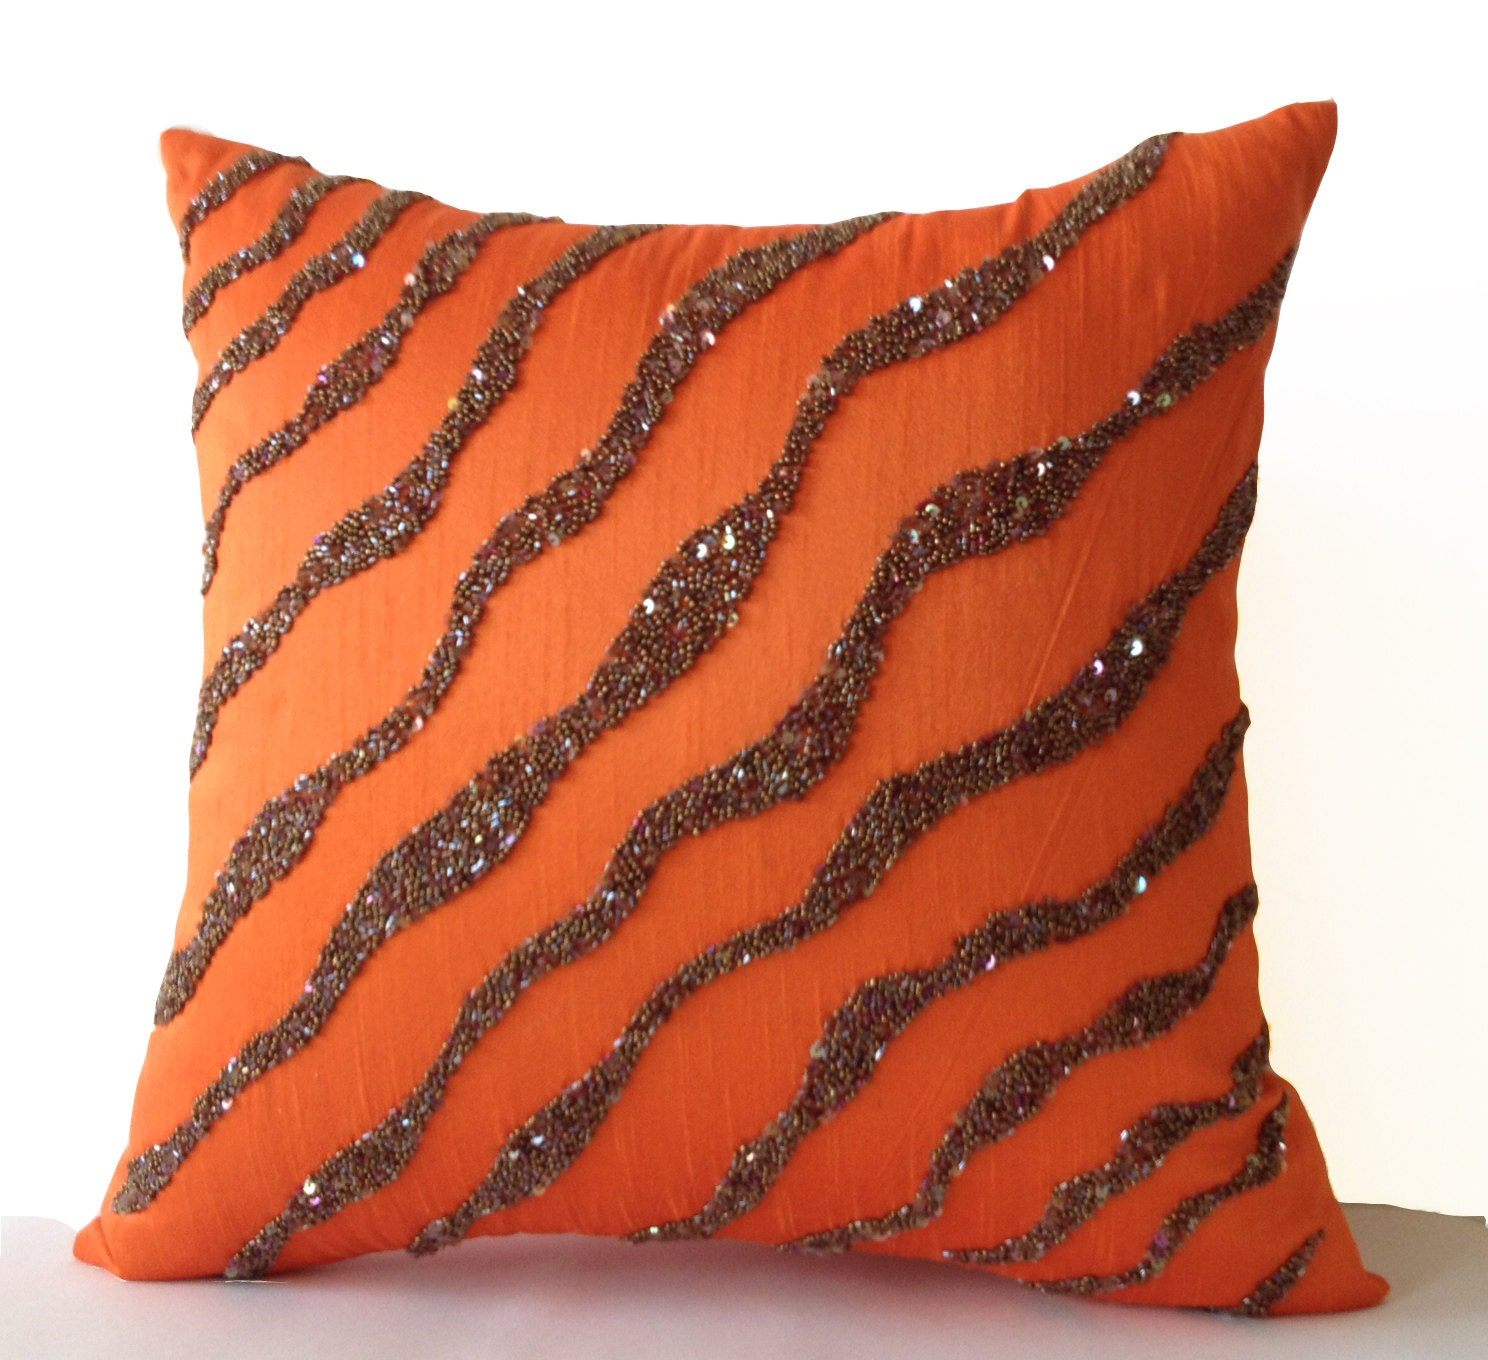 c elaine lumbar throws all blankets pillow orange throw pillows smith nordstrom